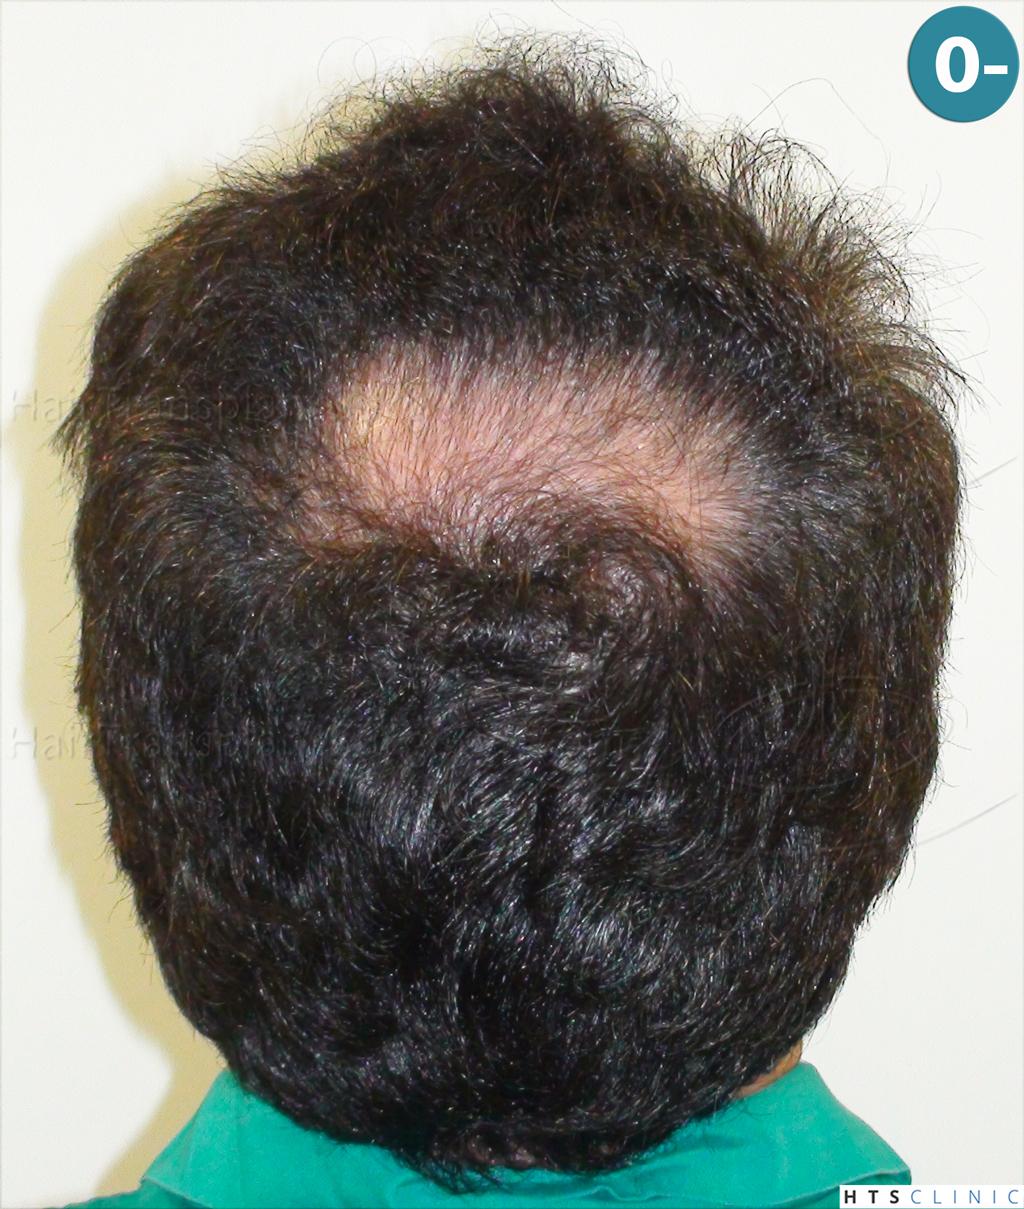 Dr.Devroye-HTS-Clinic-983-FUT-Vertex-2.jpg